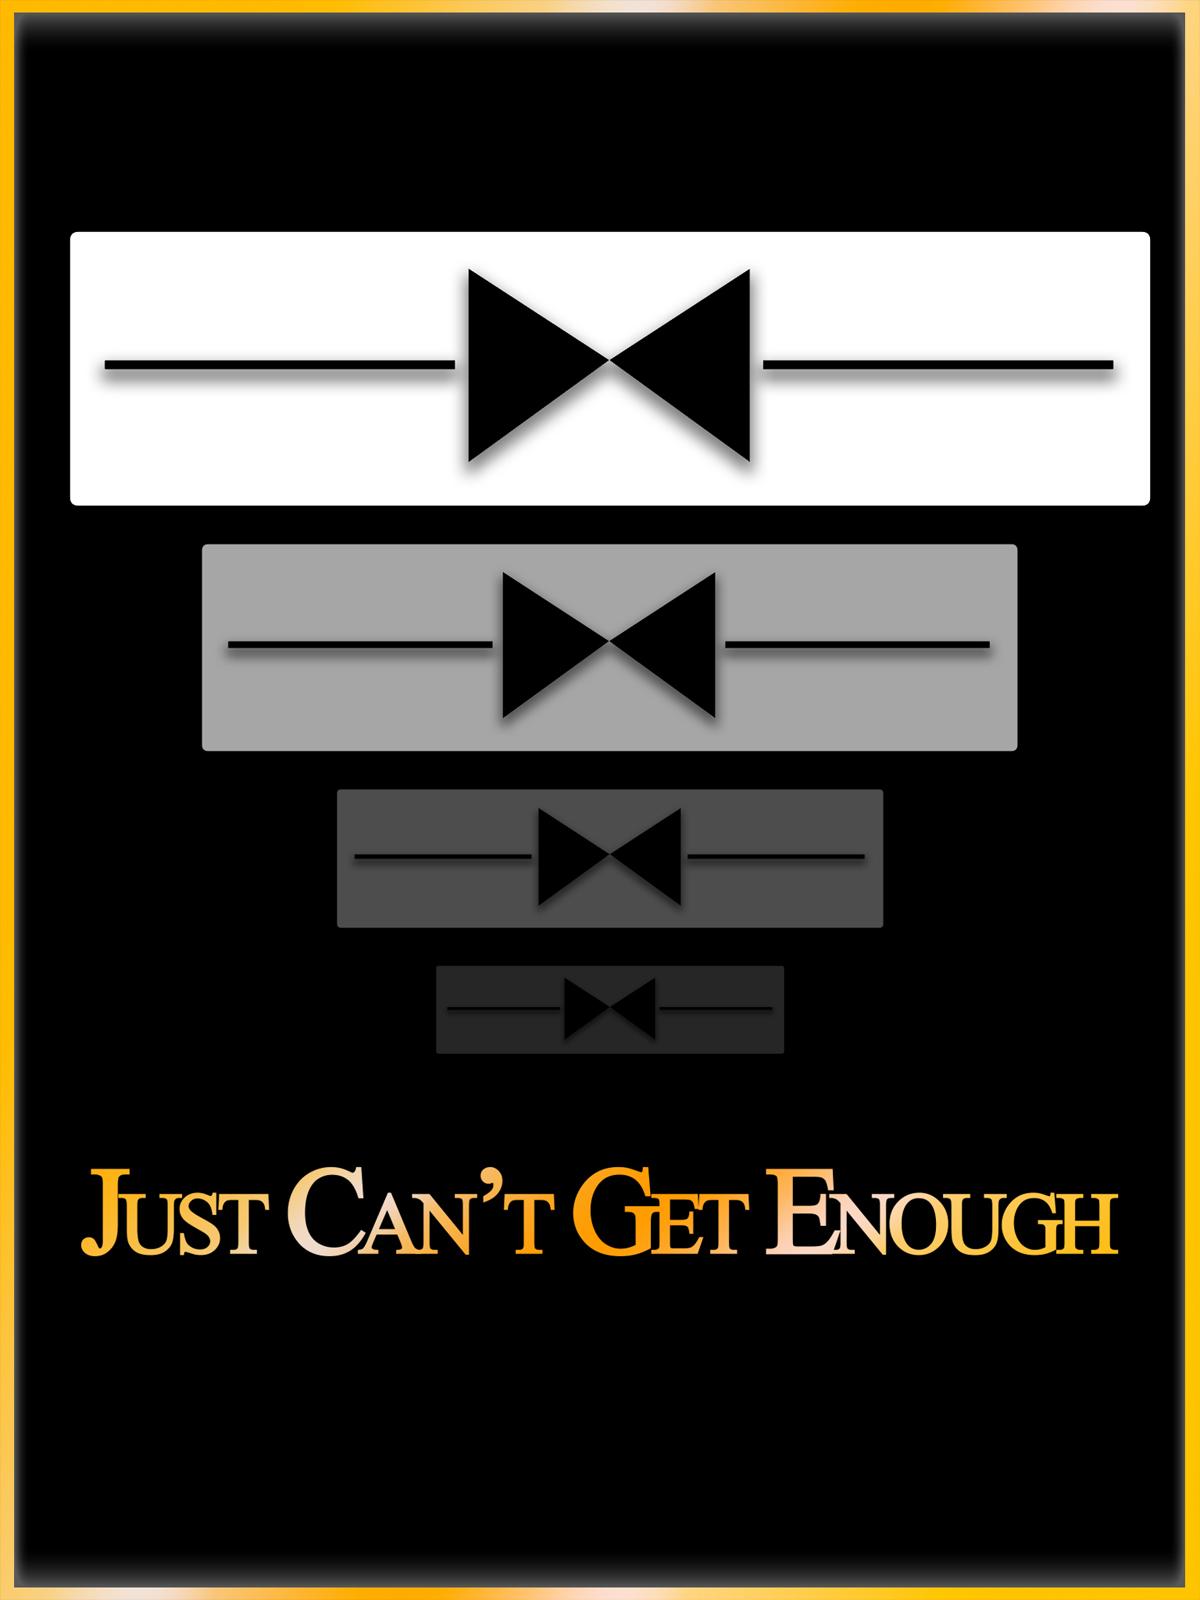 Here-JustCantGetEnough-Full-Image-en-US.jpg